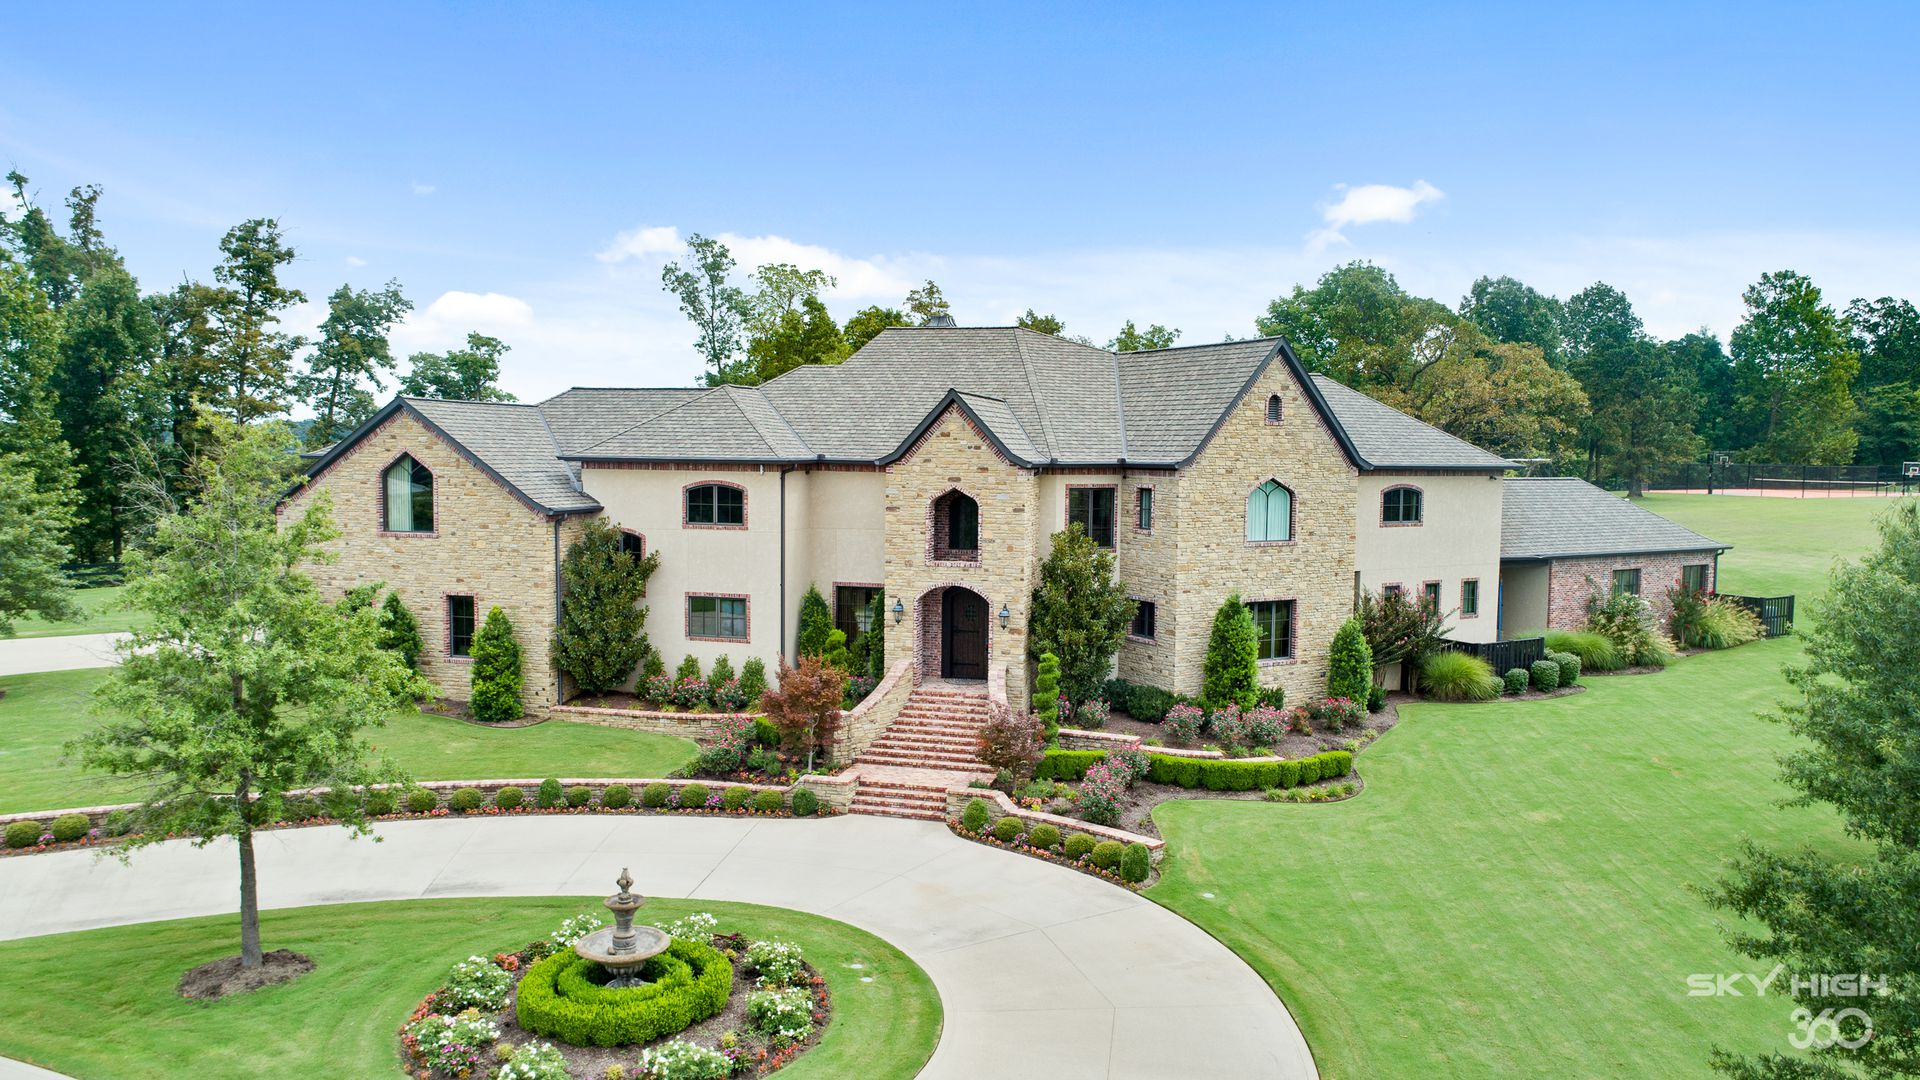 Photo of a mansion in Springdale, Ark.